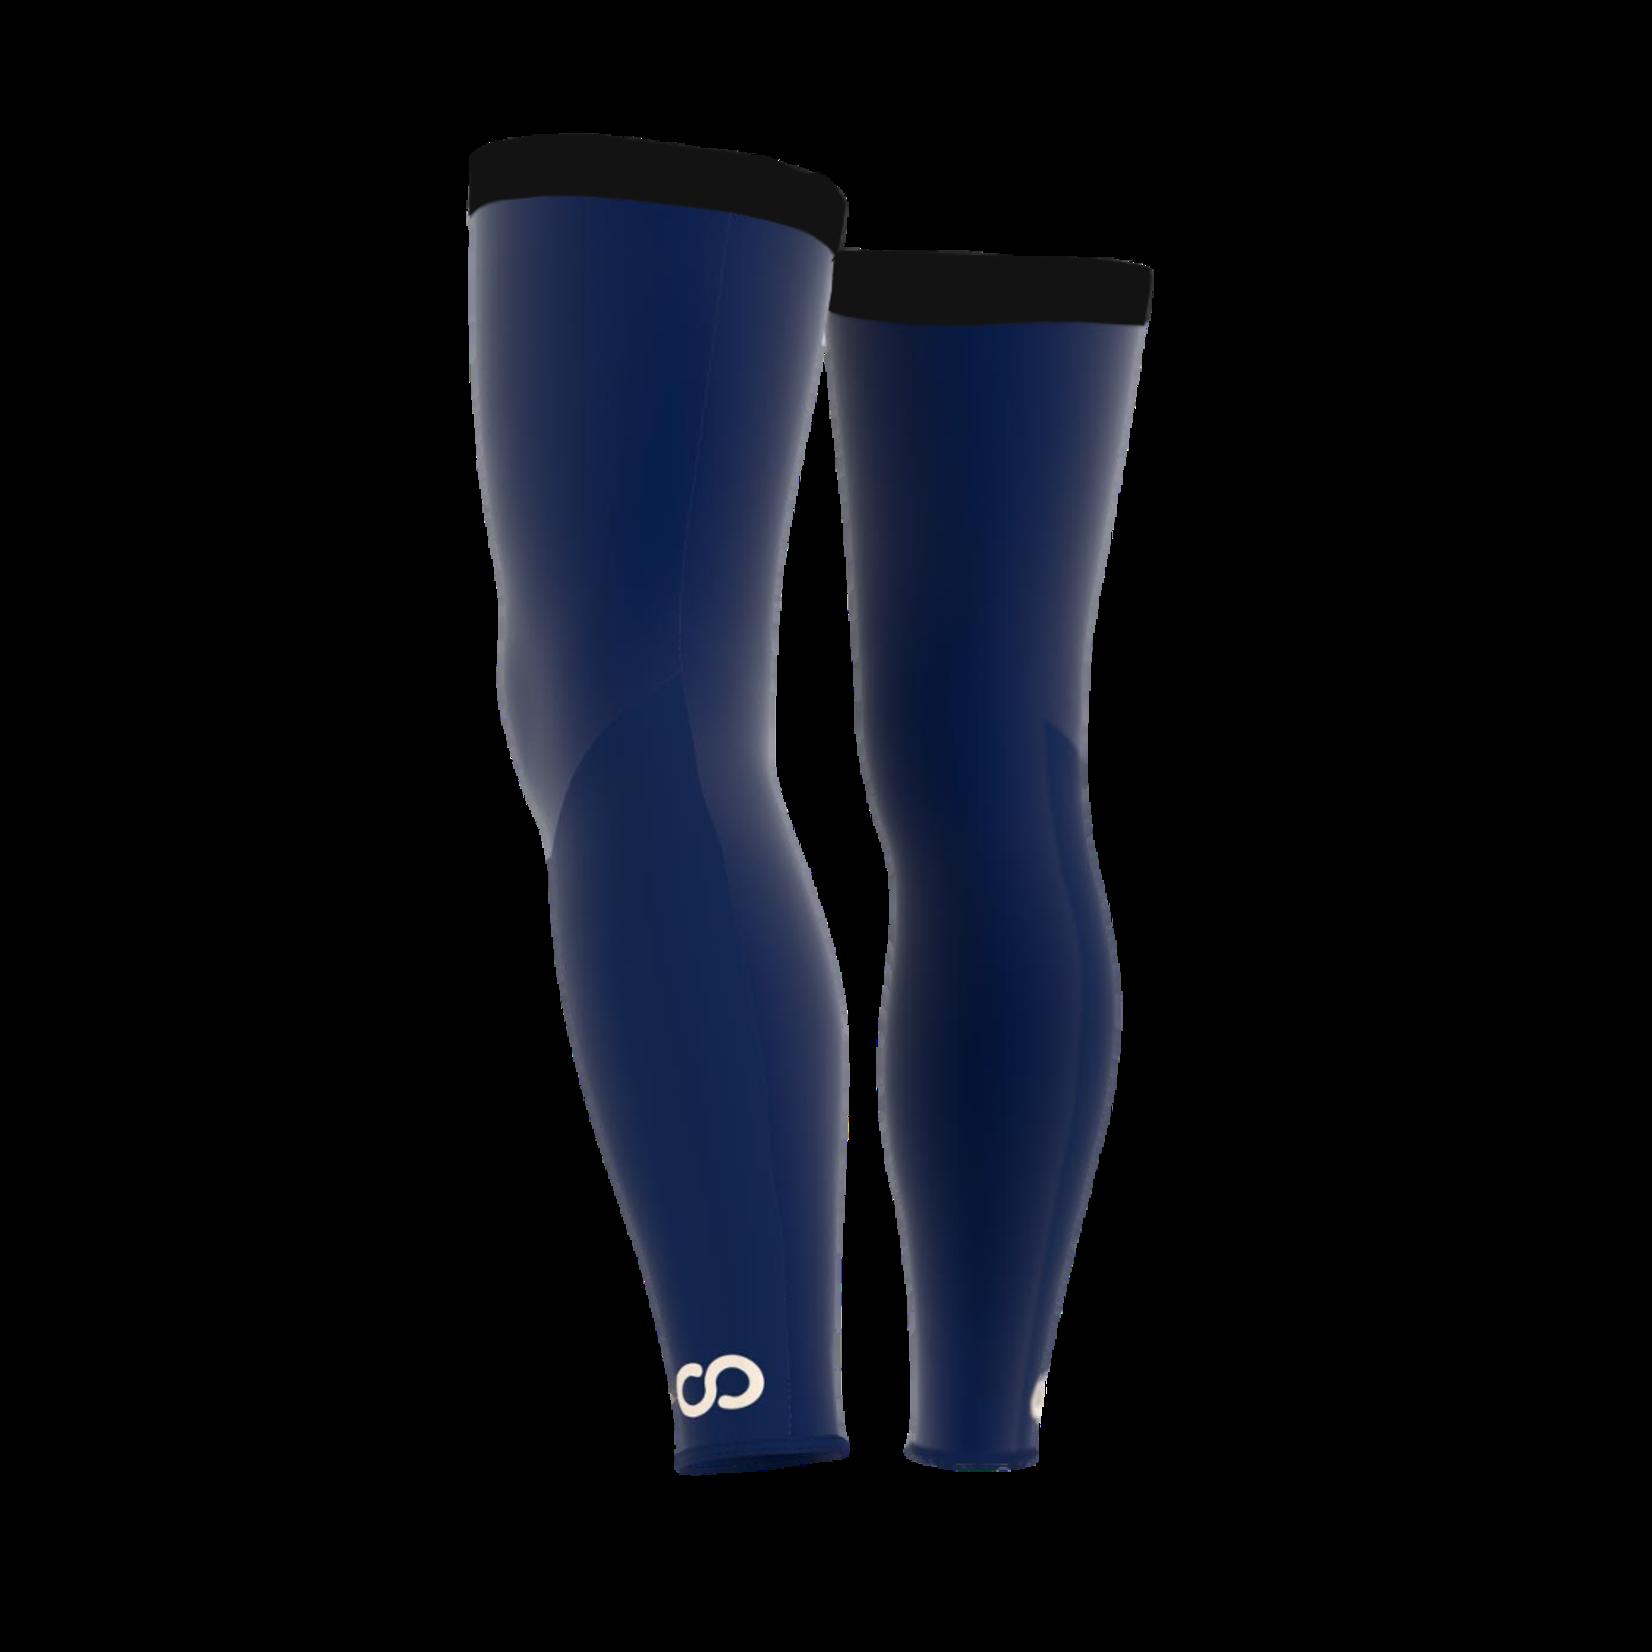 WOOBI-cycling MOUNTAINS legs